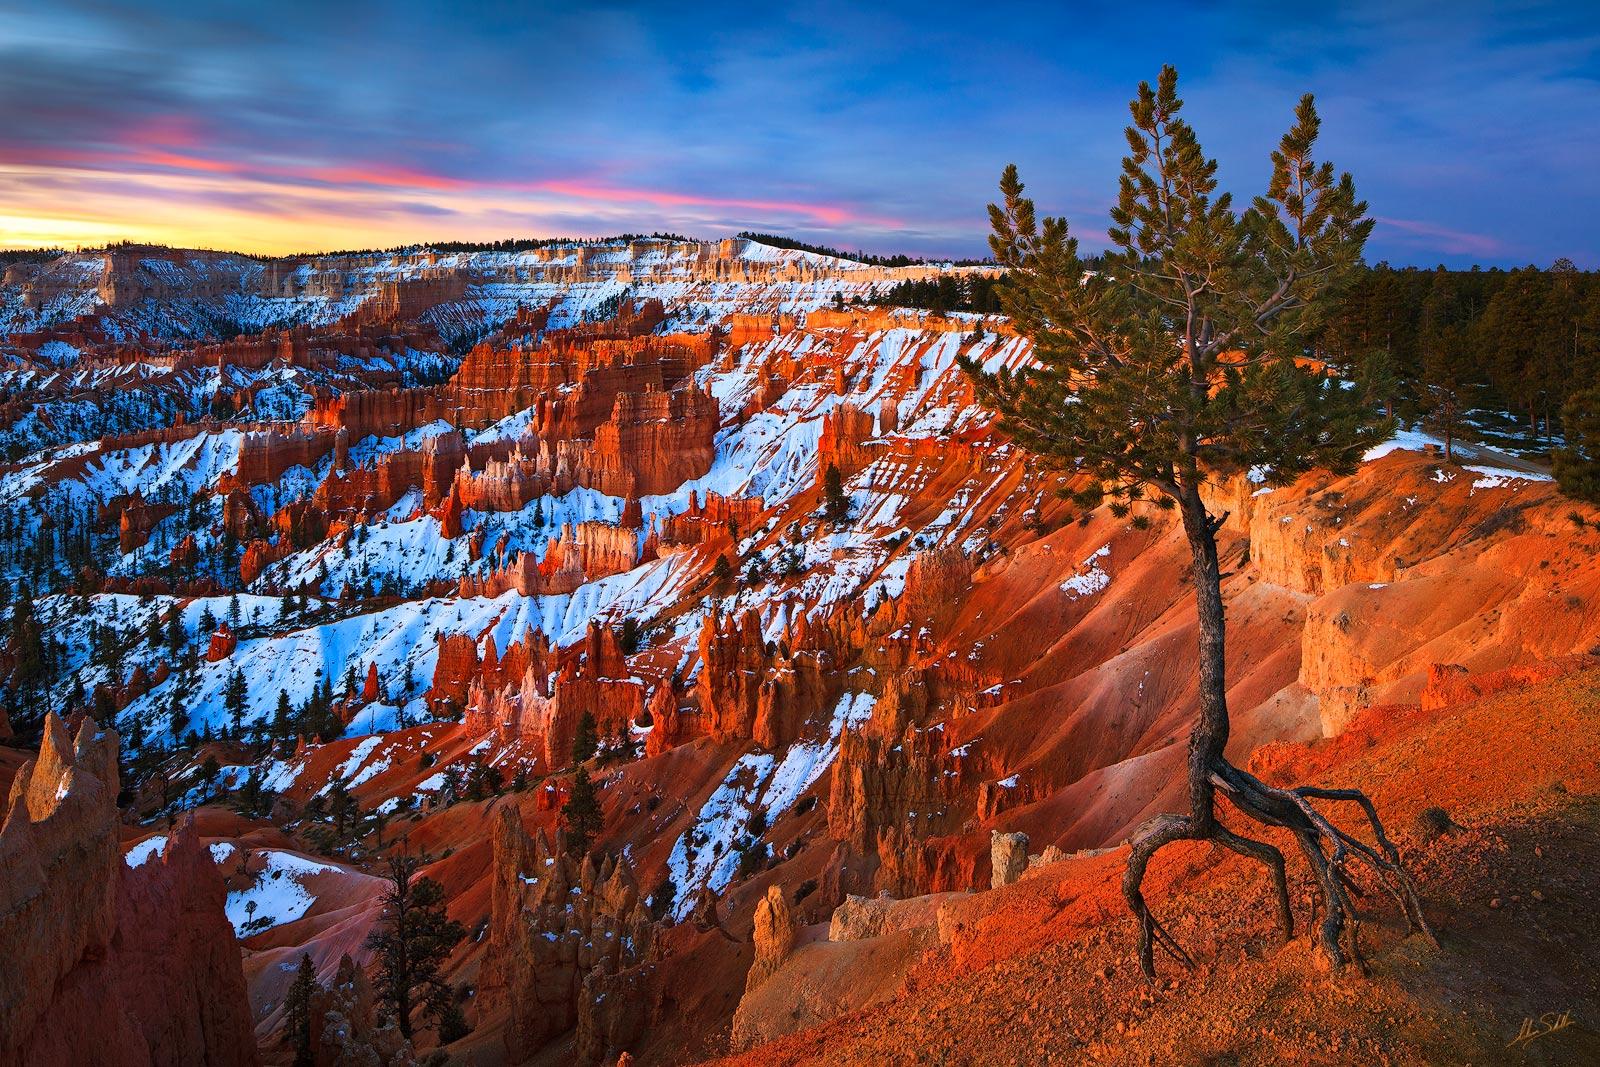 BRCA, Bryce Canyon, Hoodoos, National Park, Sandstone, Sunrise Point, Tree, USA, UT, Utah, geology, photo